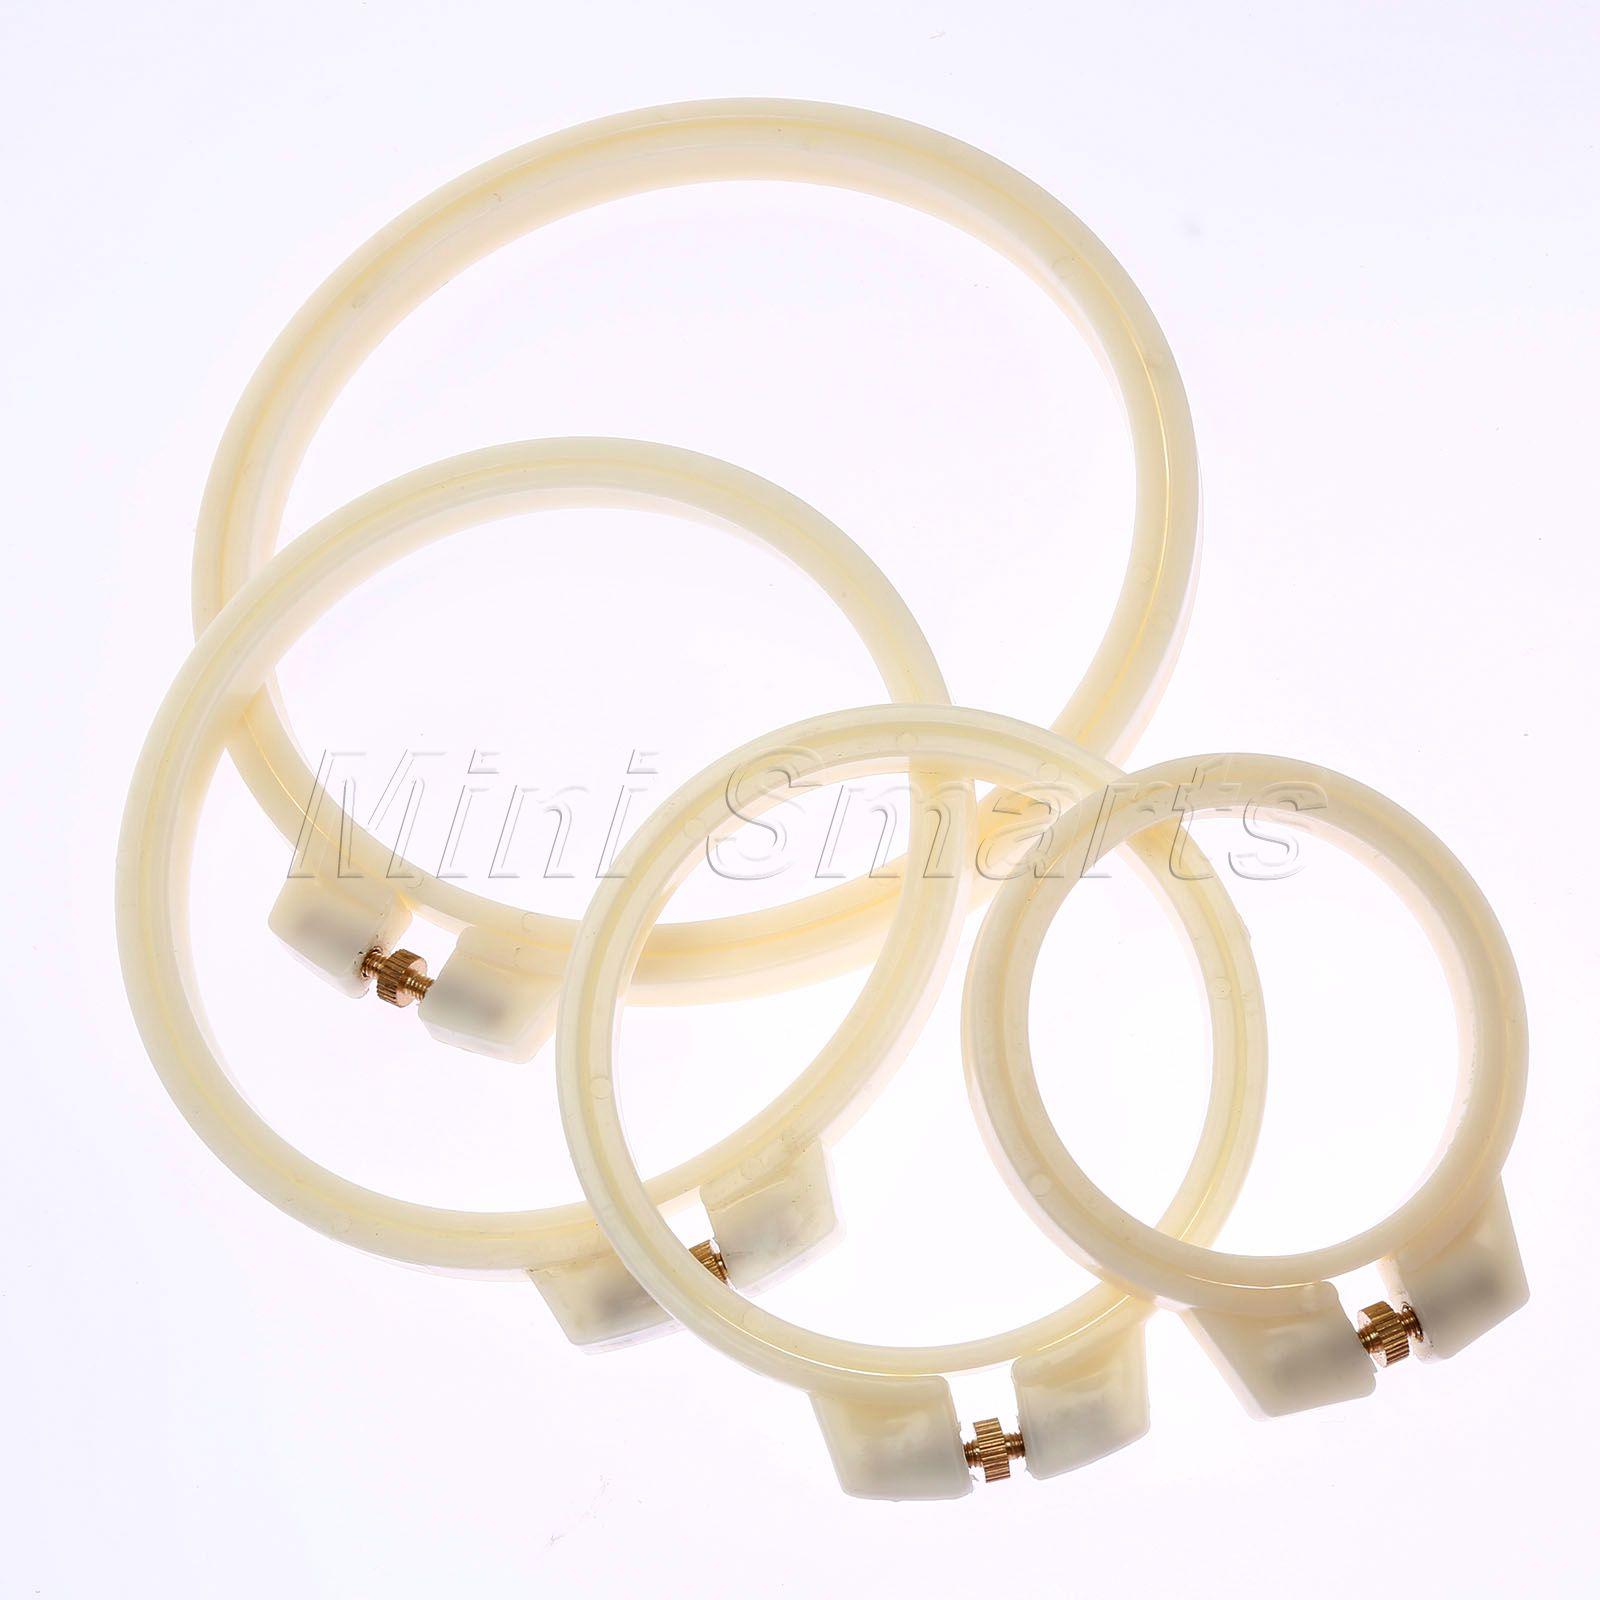 Popular plain rings for crafts buy cheap plain rings for for Large plastic rings for crafts